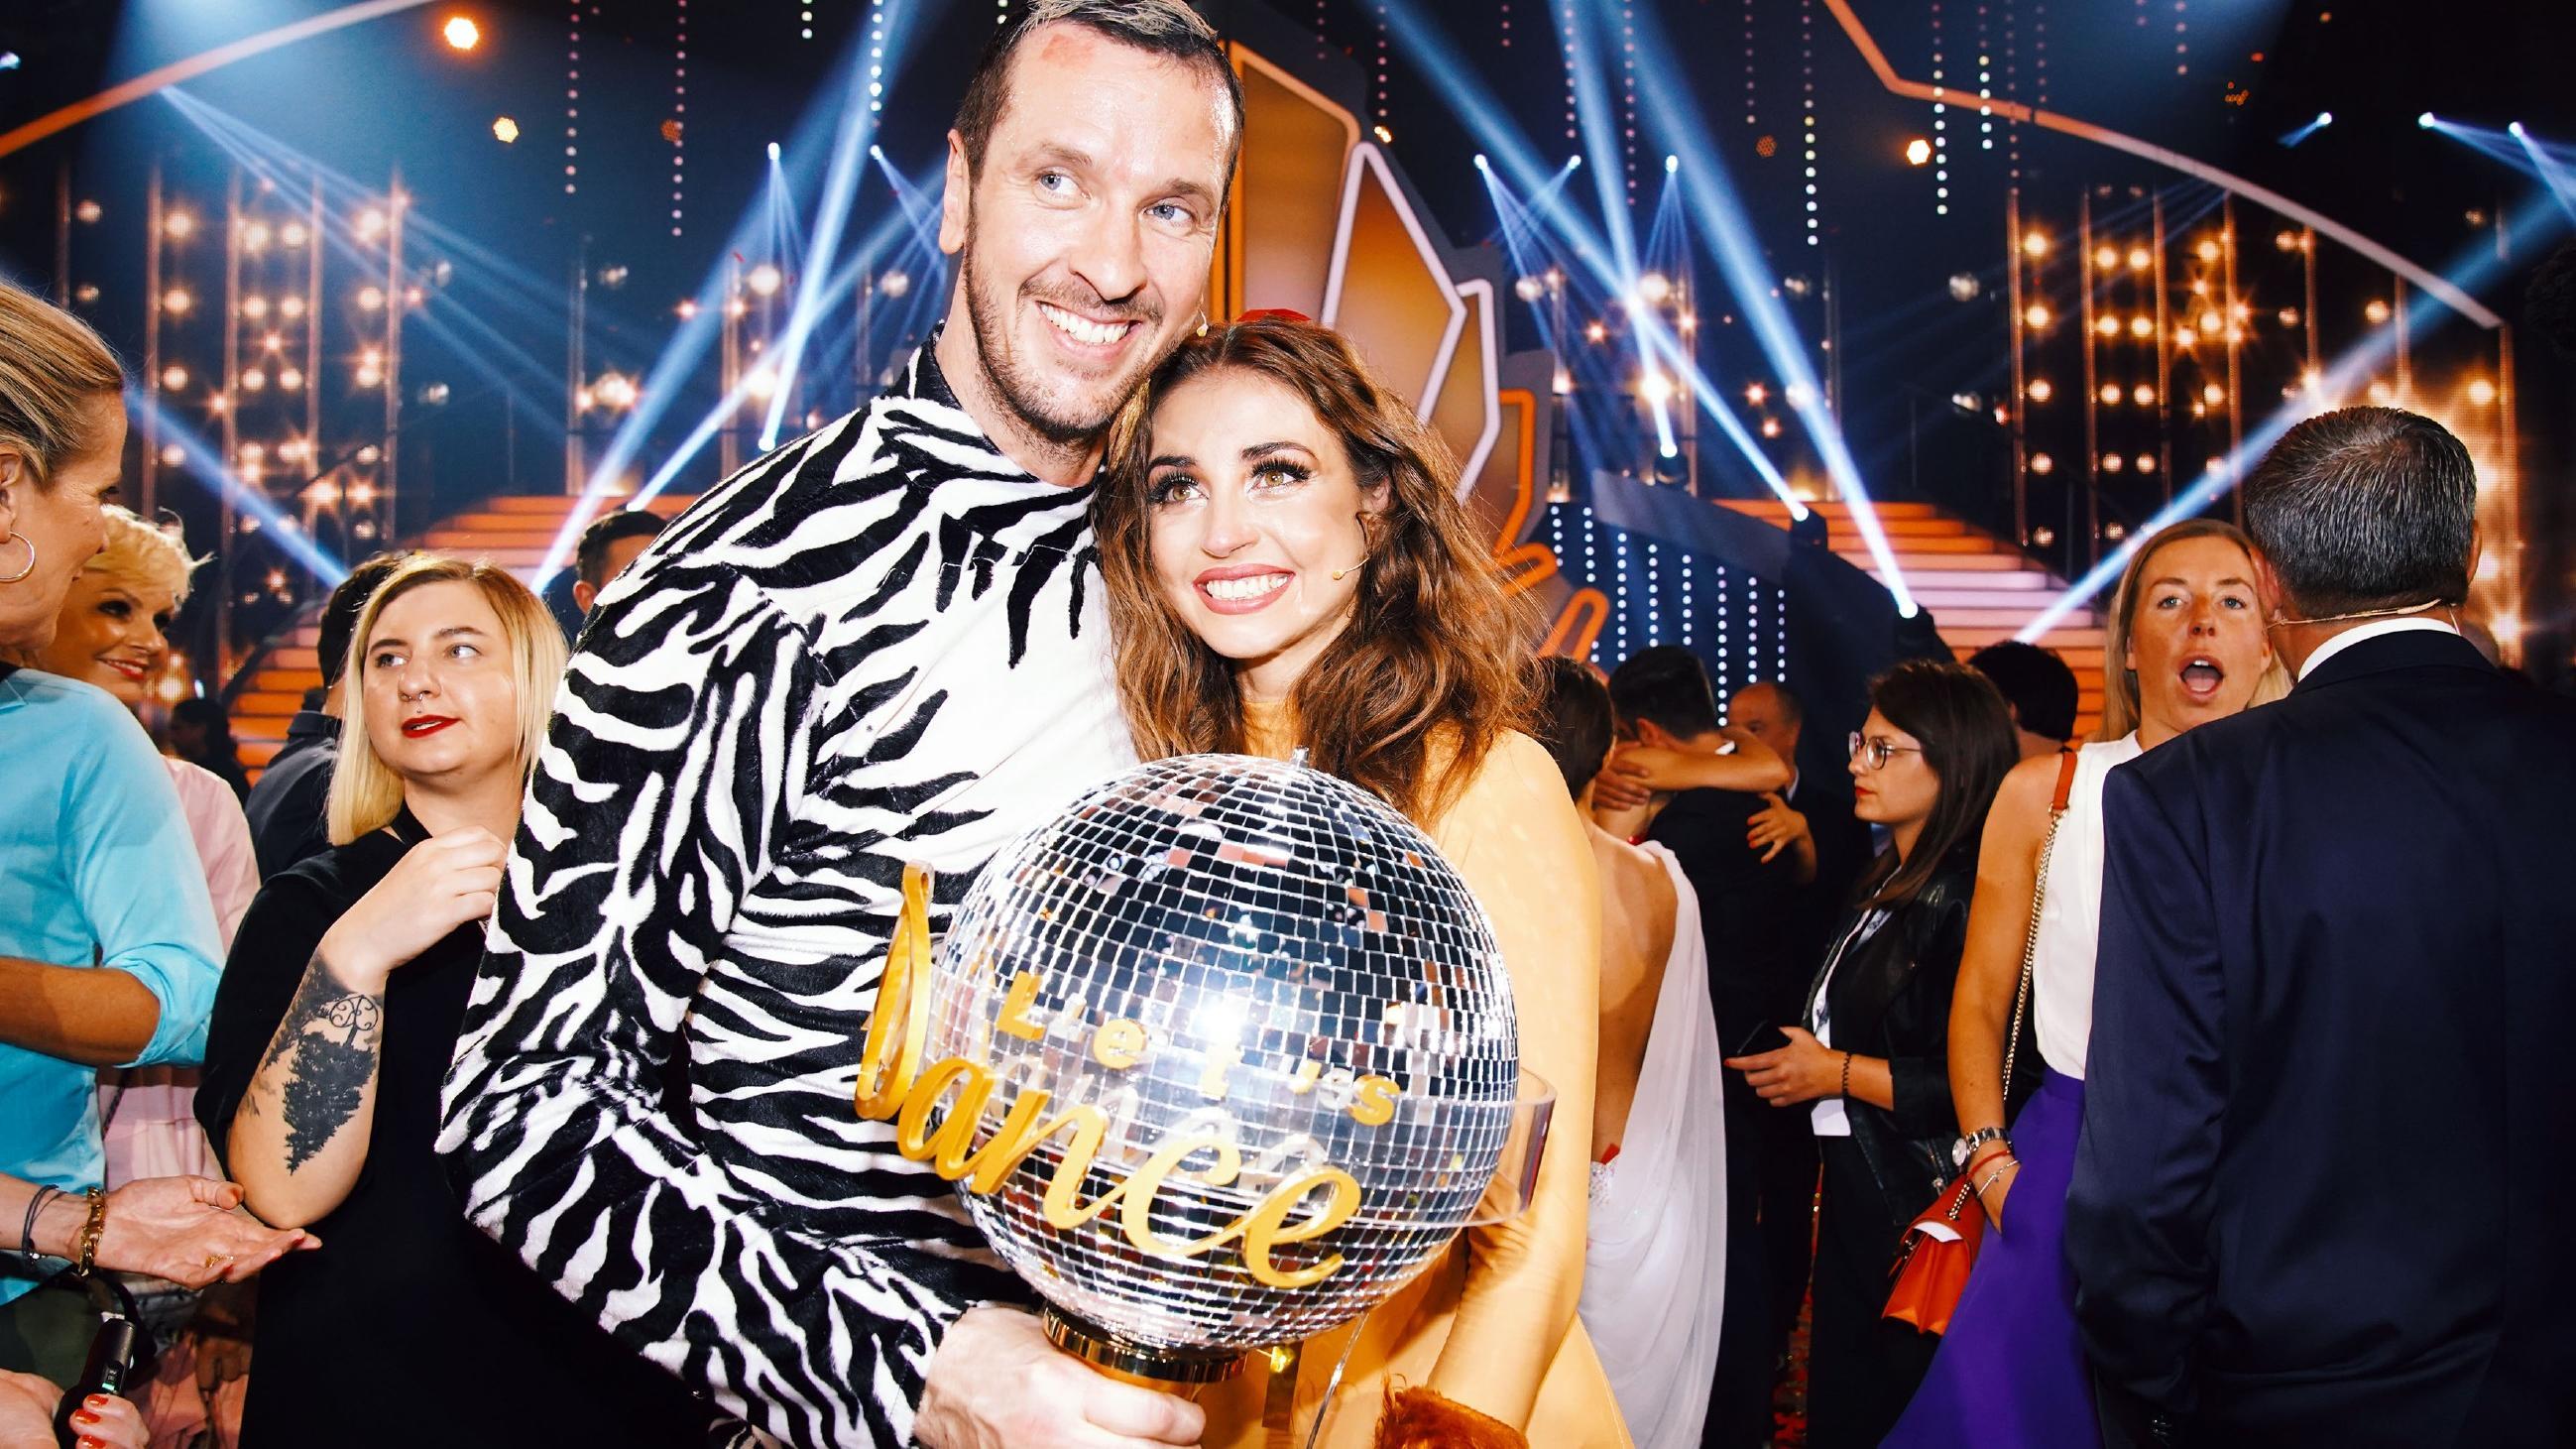 Let S Dance 2021 Das Machen Fruhere Sieger Wie Wayne Carpendale Maite Kelly Co Heute